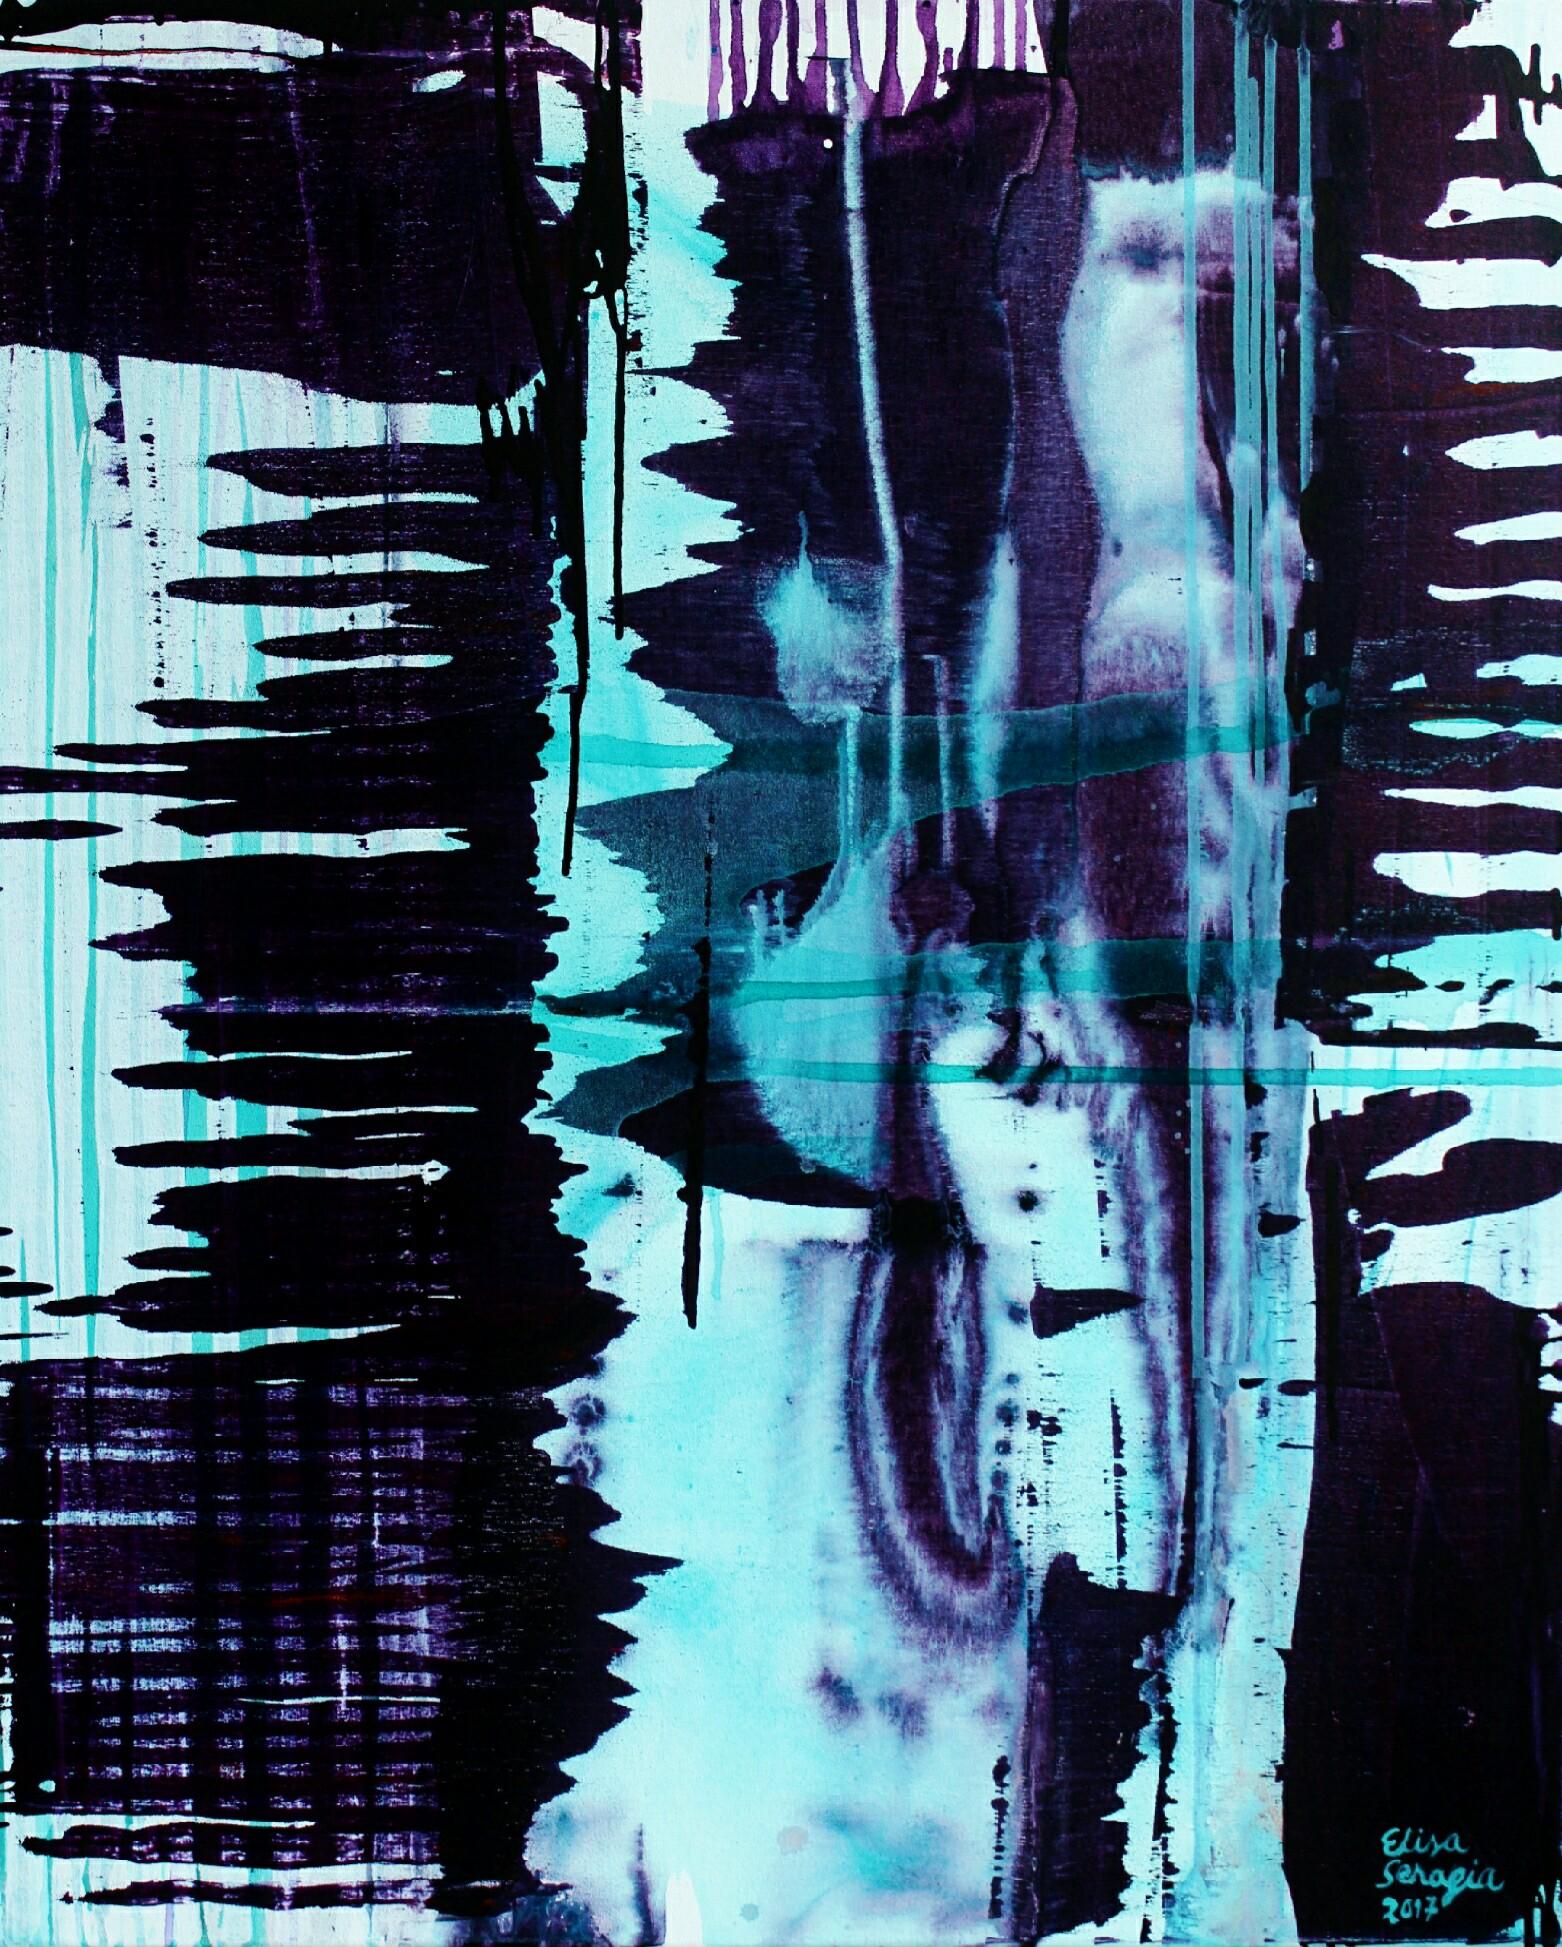 Helmikuu, Akryyli kankaalle, 100 cm x 80 cm  Myyty / Sold